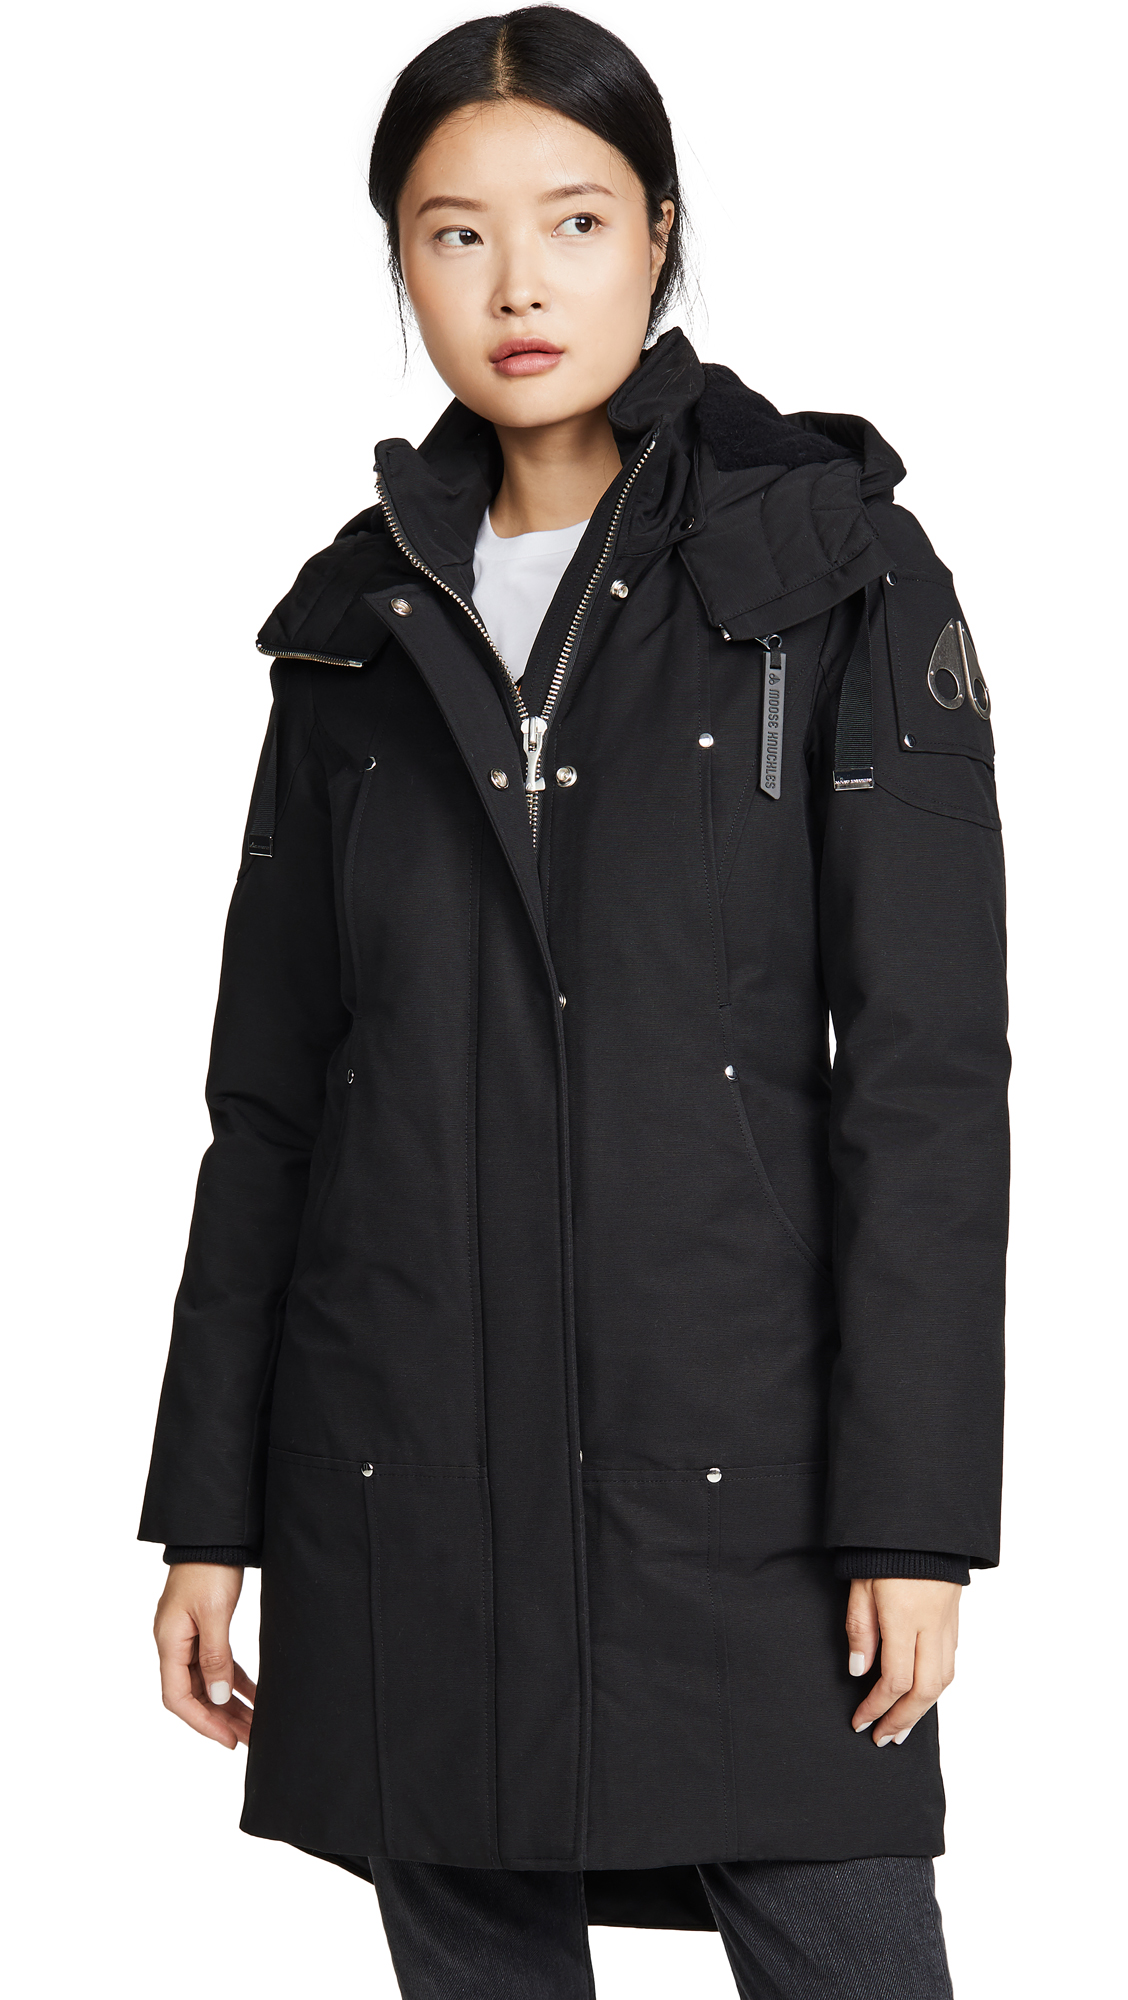 Buy Moose Knuckles Longue Rive Parka online beautiful Moose Knuckles Jackets, Coats, Down Jackets